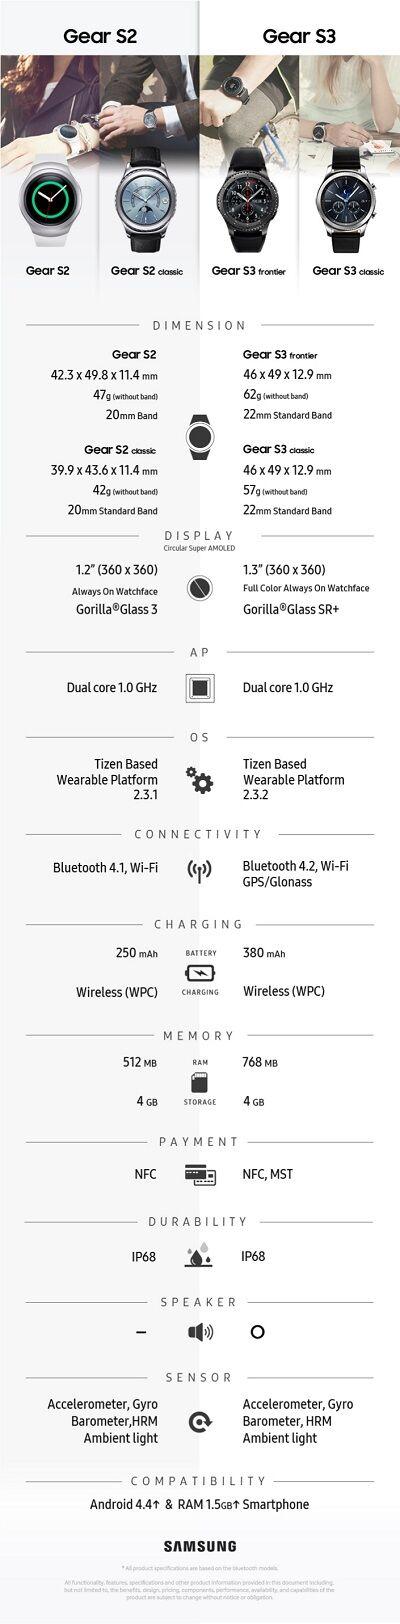 Spesifikasi Samsung Gear S3